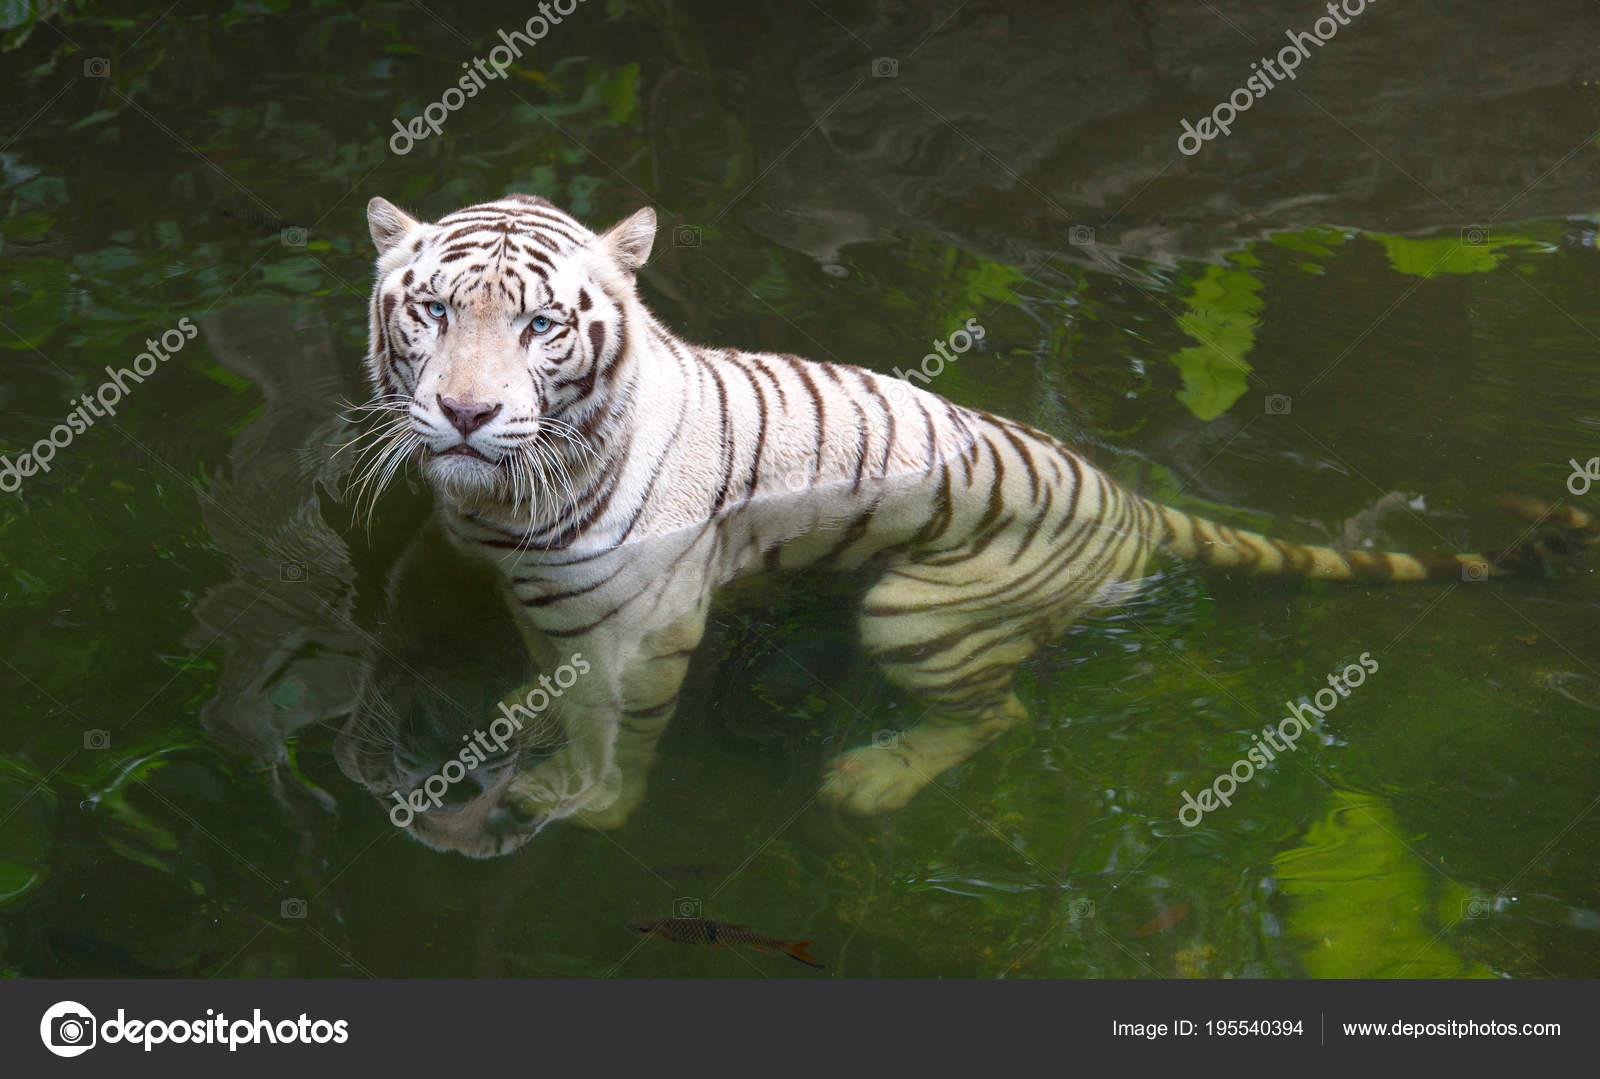 2 709 Tiger Blue Eyes Stock Photos Free Royalty Free Tiger Blue Eyes Images Depositphotos